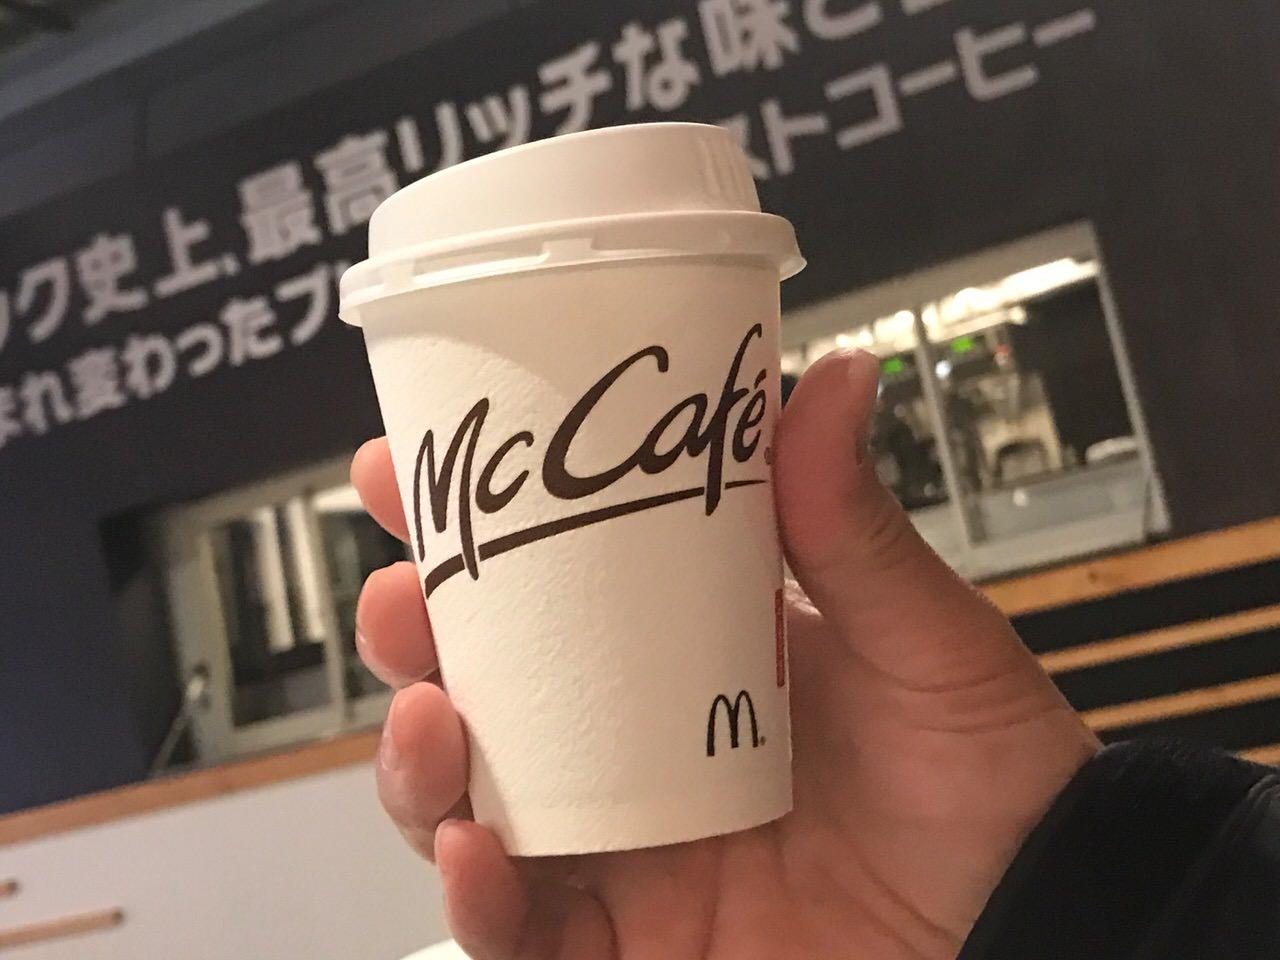 Mccafe 4325